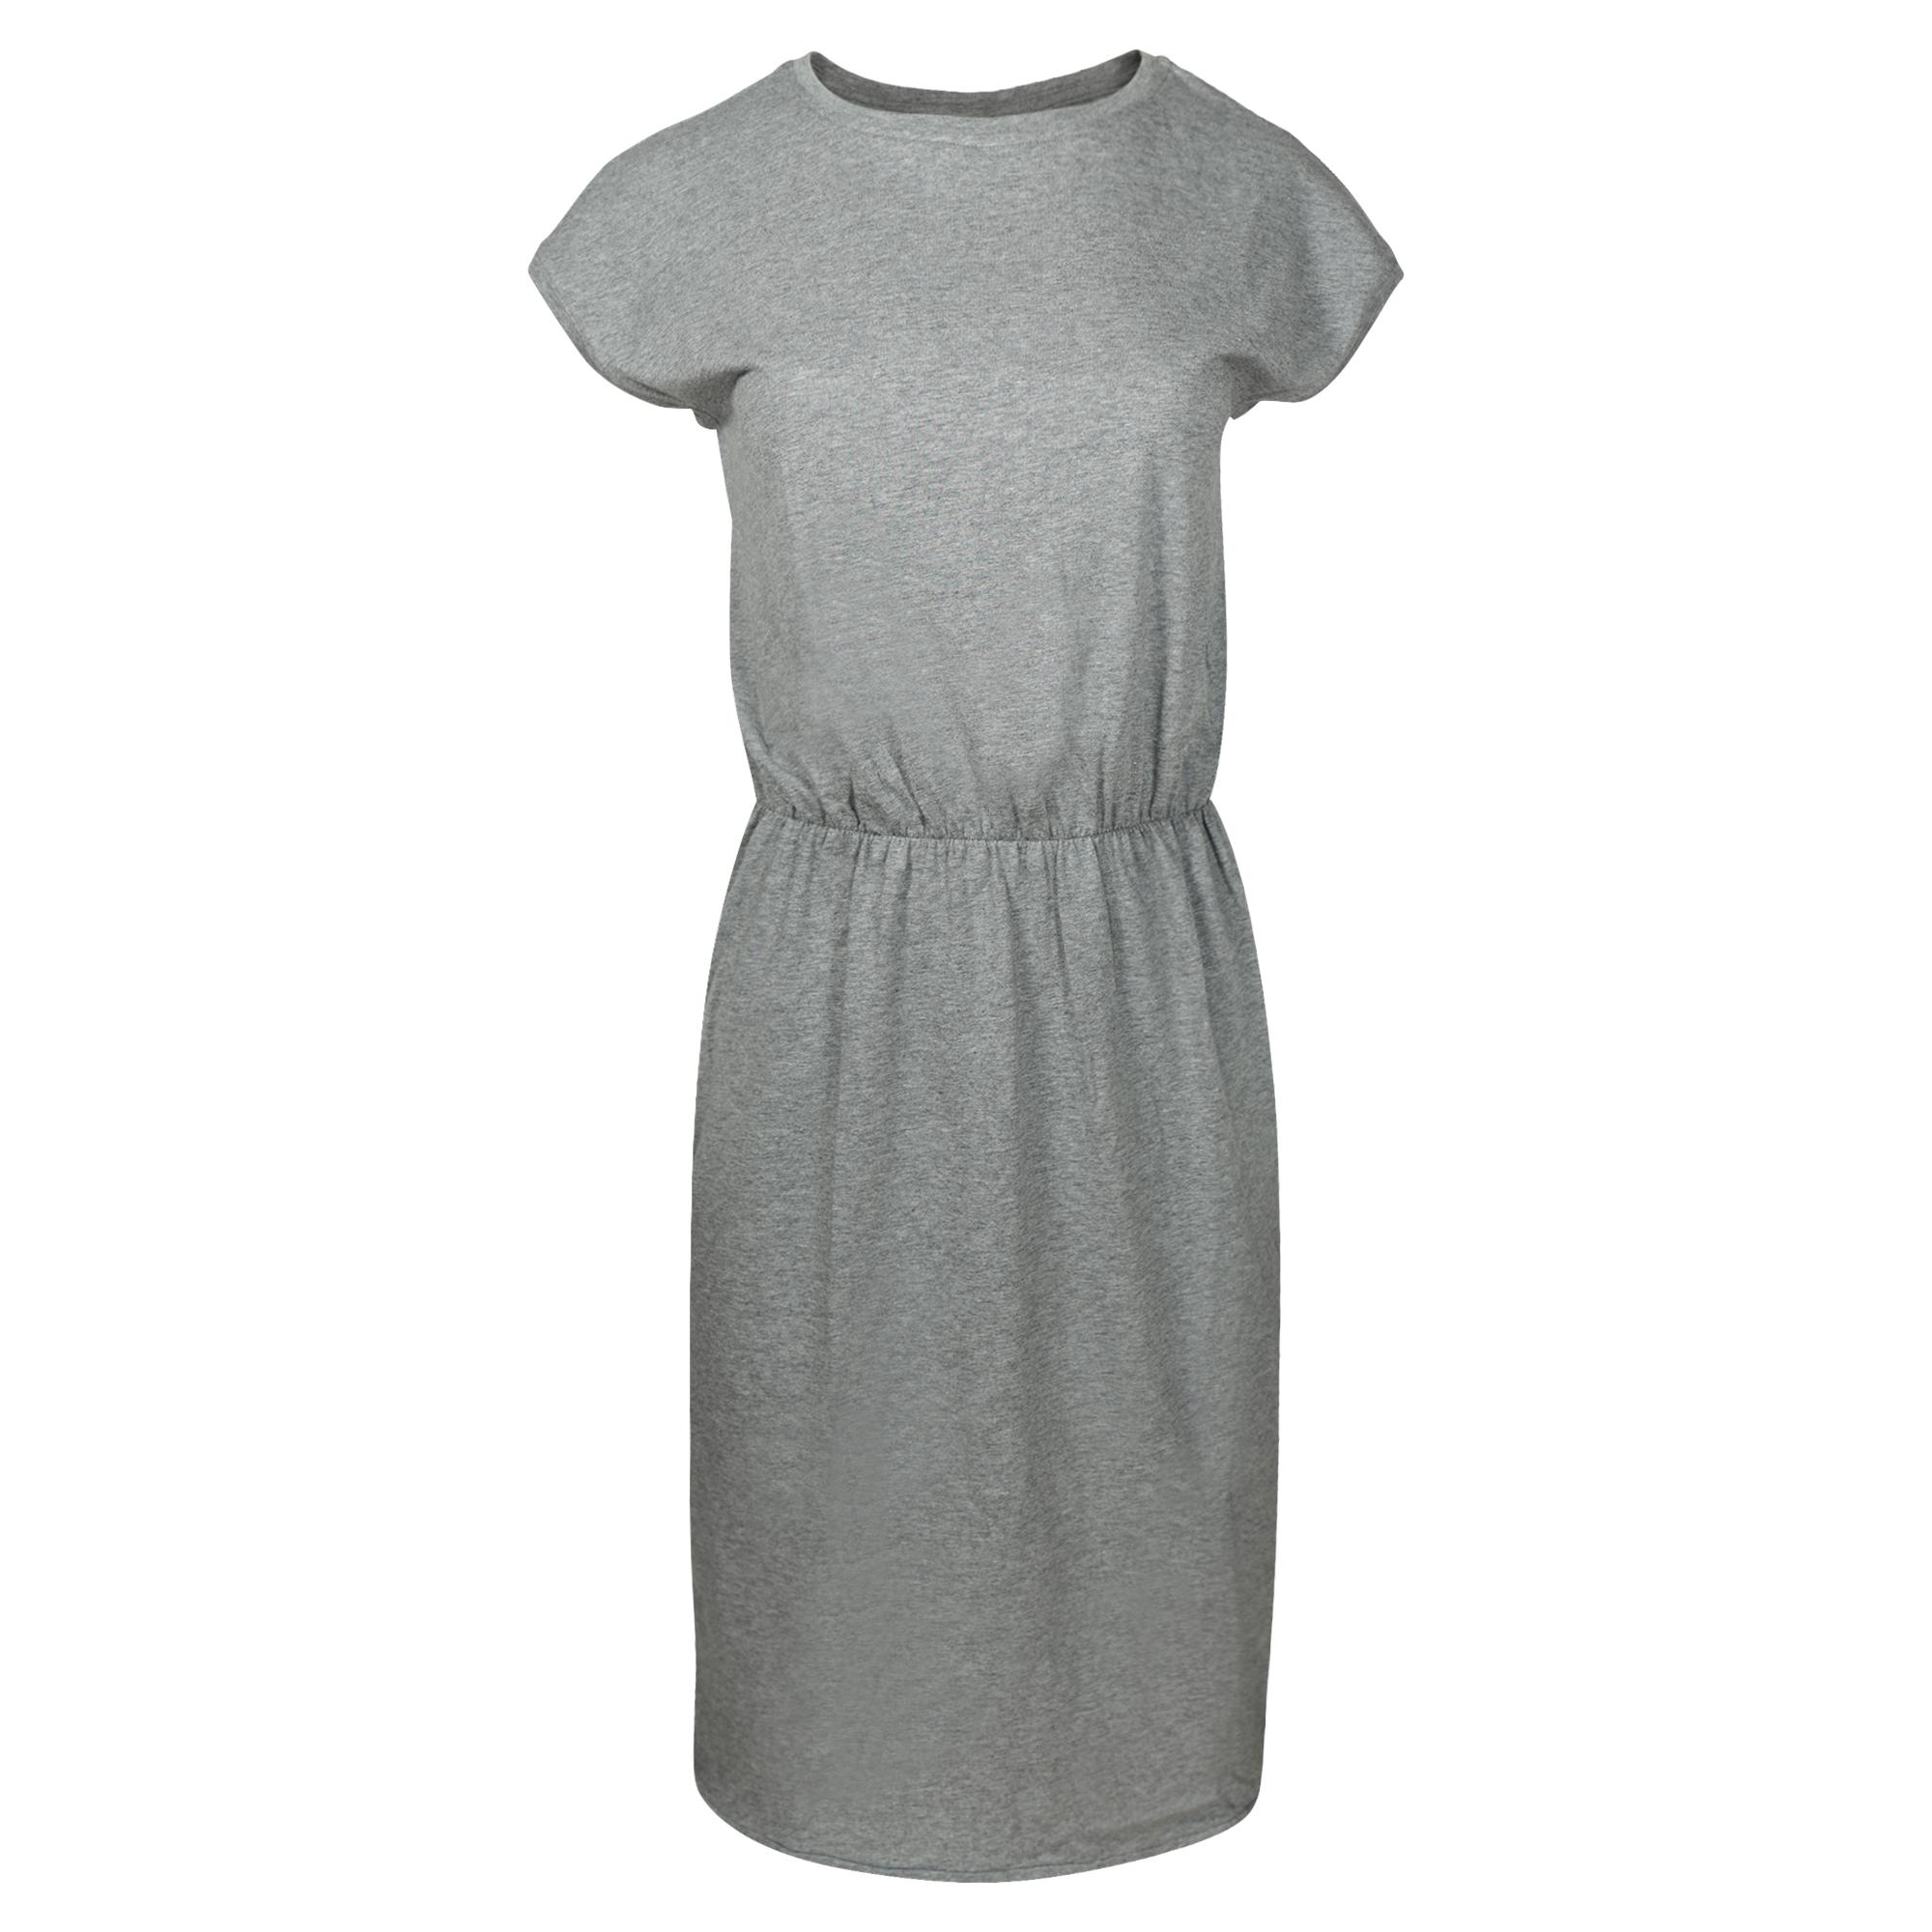 LOVJOI ODEMIRA Dress dark grey melange Bio & Fair